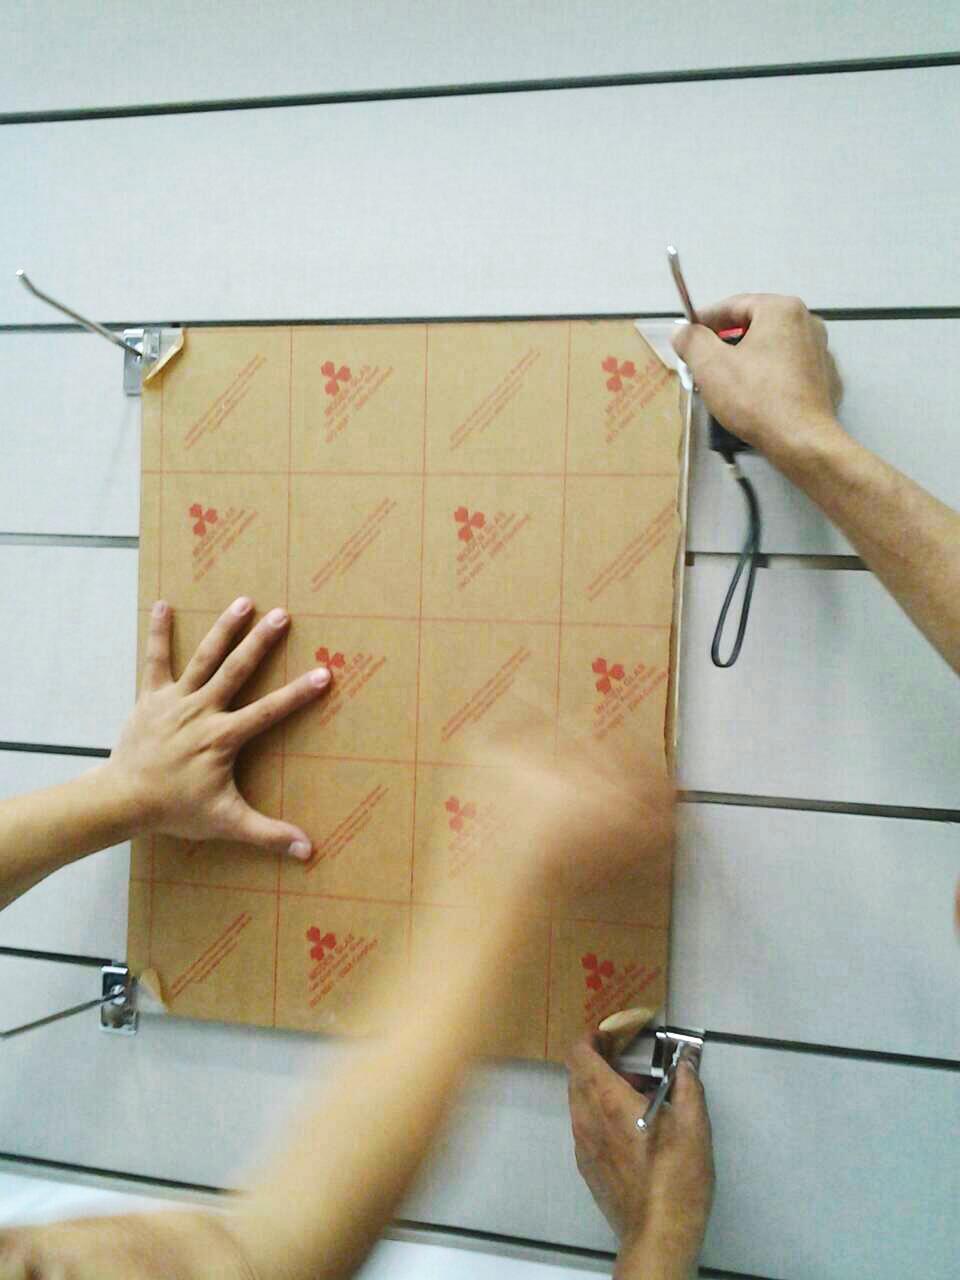 10DESIGN spring shop mobile retail commercial interior design construct 03